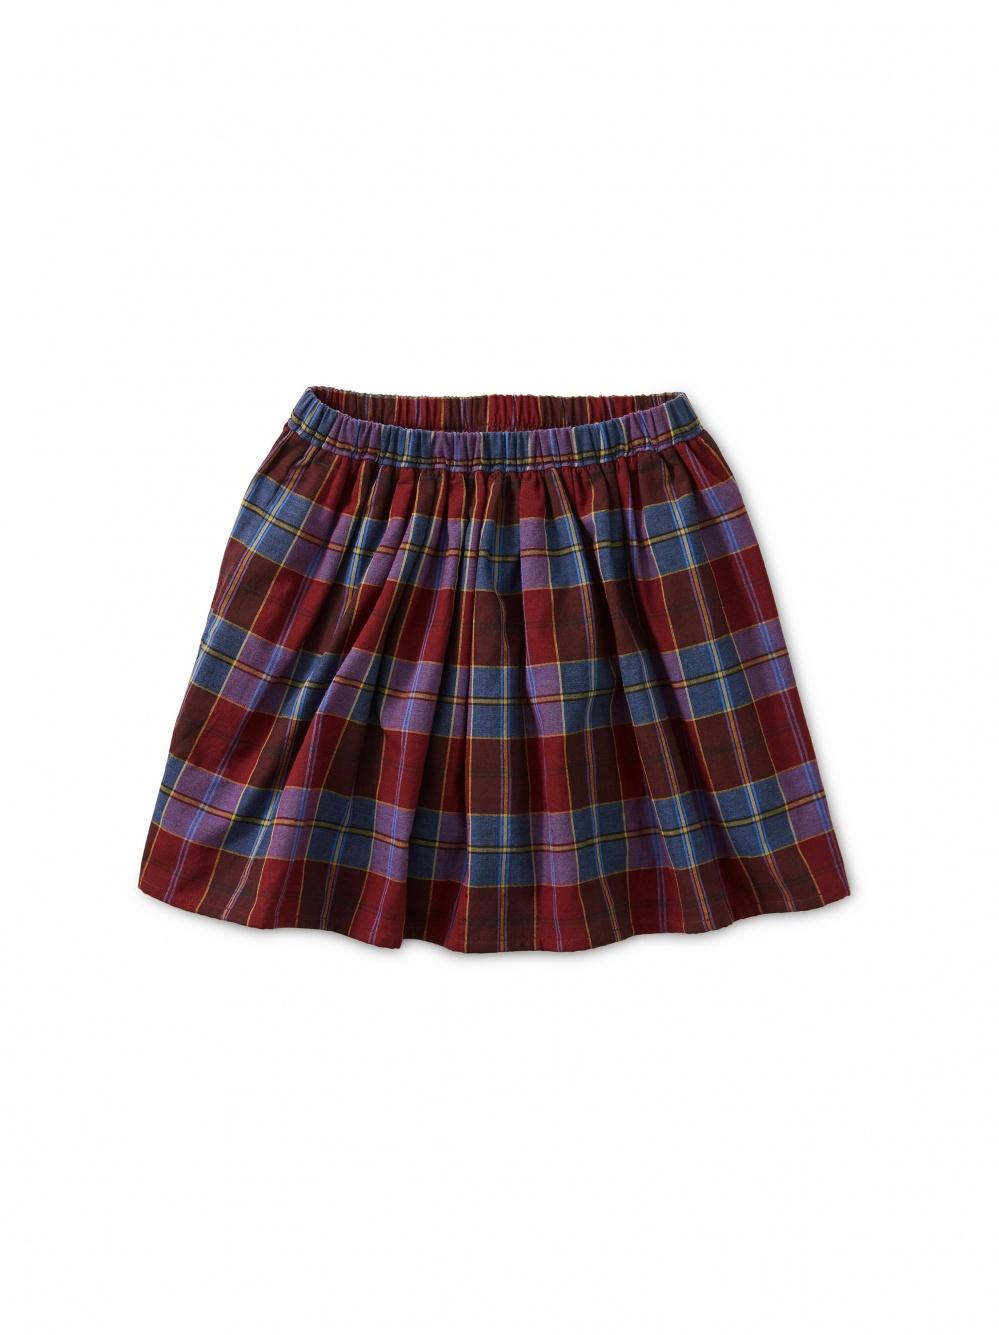 Family Plaid Twirl Skirt